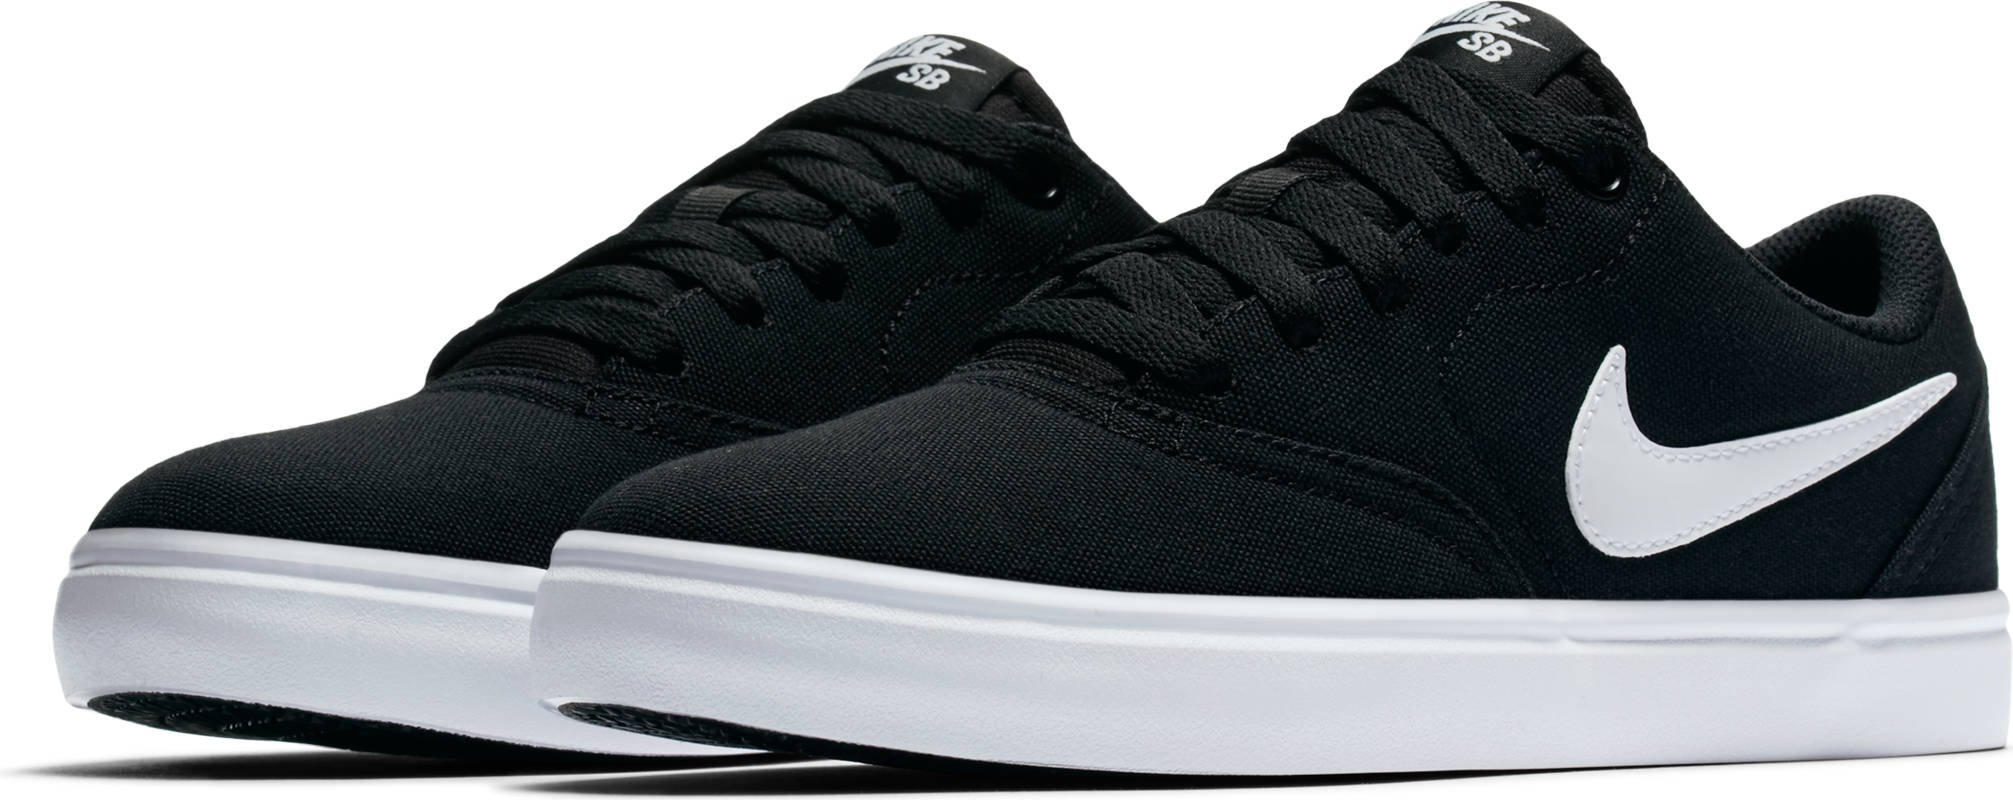 Nike New Women's SB Check Solar Canvas Skateboarding Shoe Black/White 7.5 by NIKE